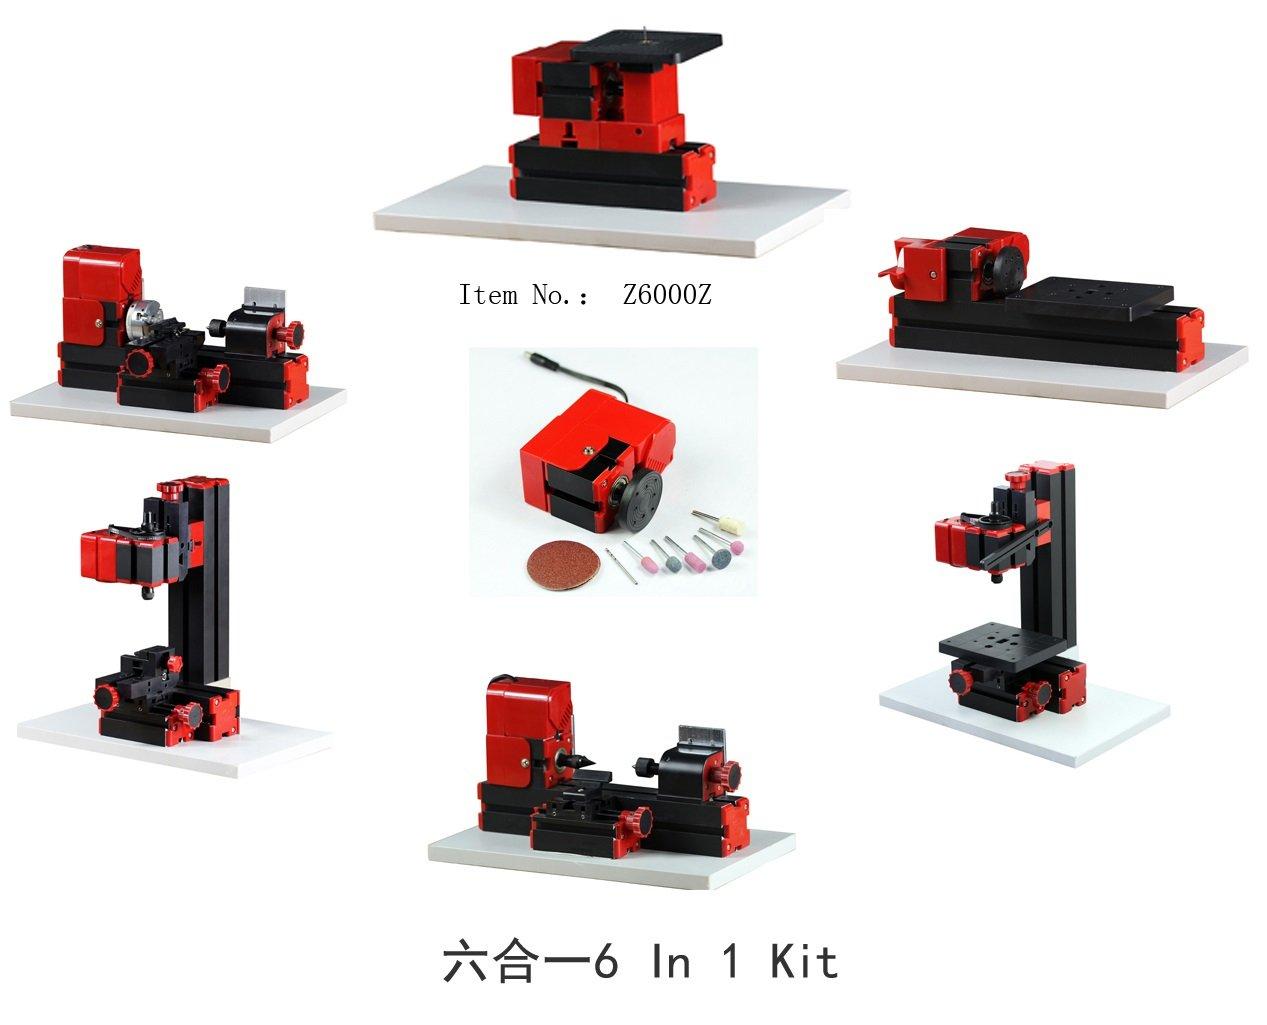 Metal Working Lathe Motorized Mini Metal Working Lathe Machine DIY Tool 6 In 1 Basic Mini Machine Kit Box For Hobby Sience Education Modelmaking